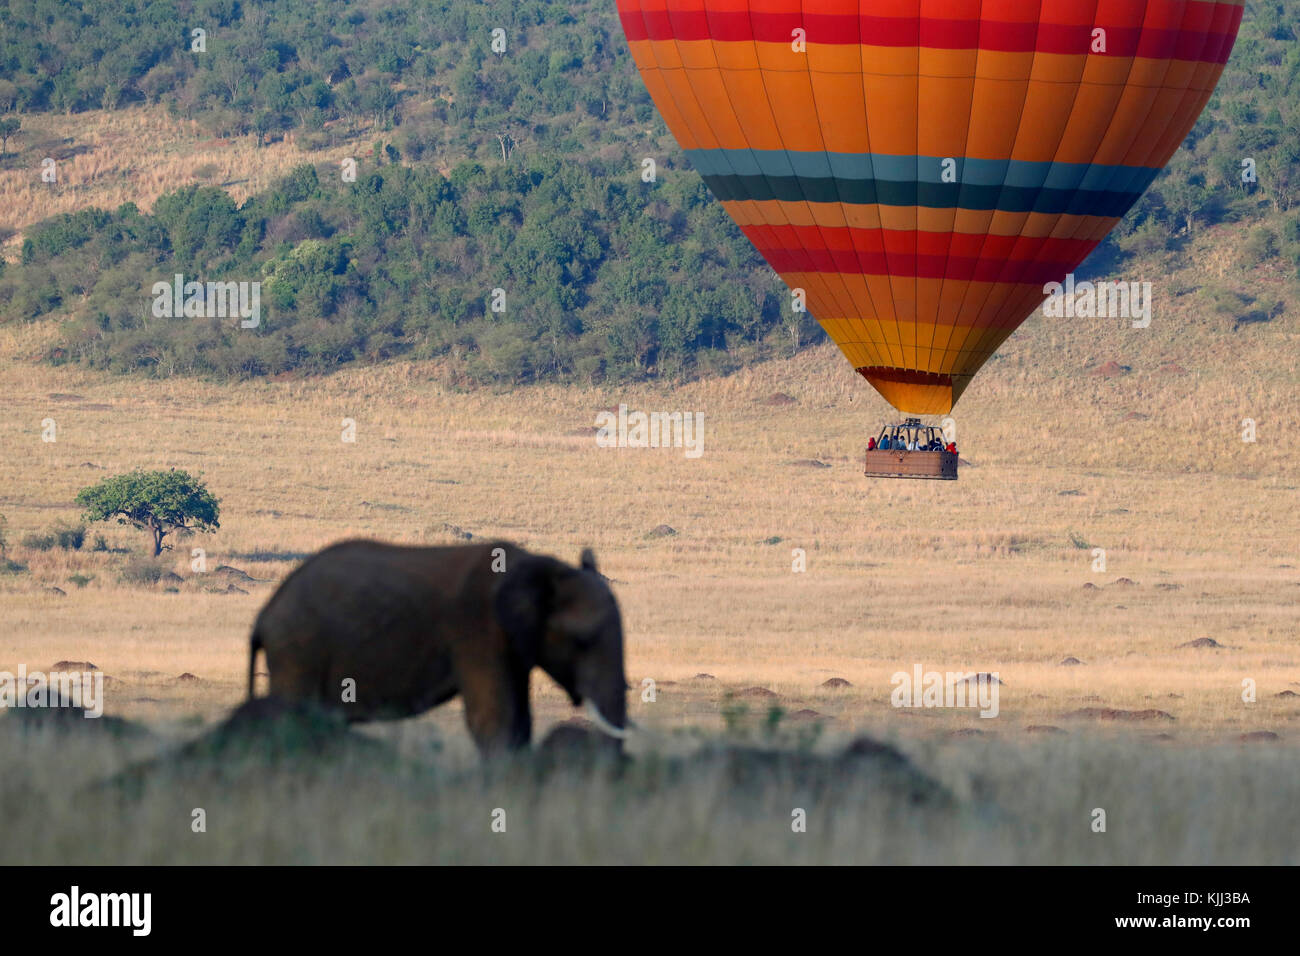 African Elephant (Loxodonta africana) and hot air balloon.  Masai Mara game reserve. Kenya. - Stock Image